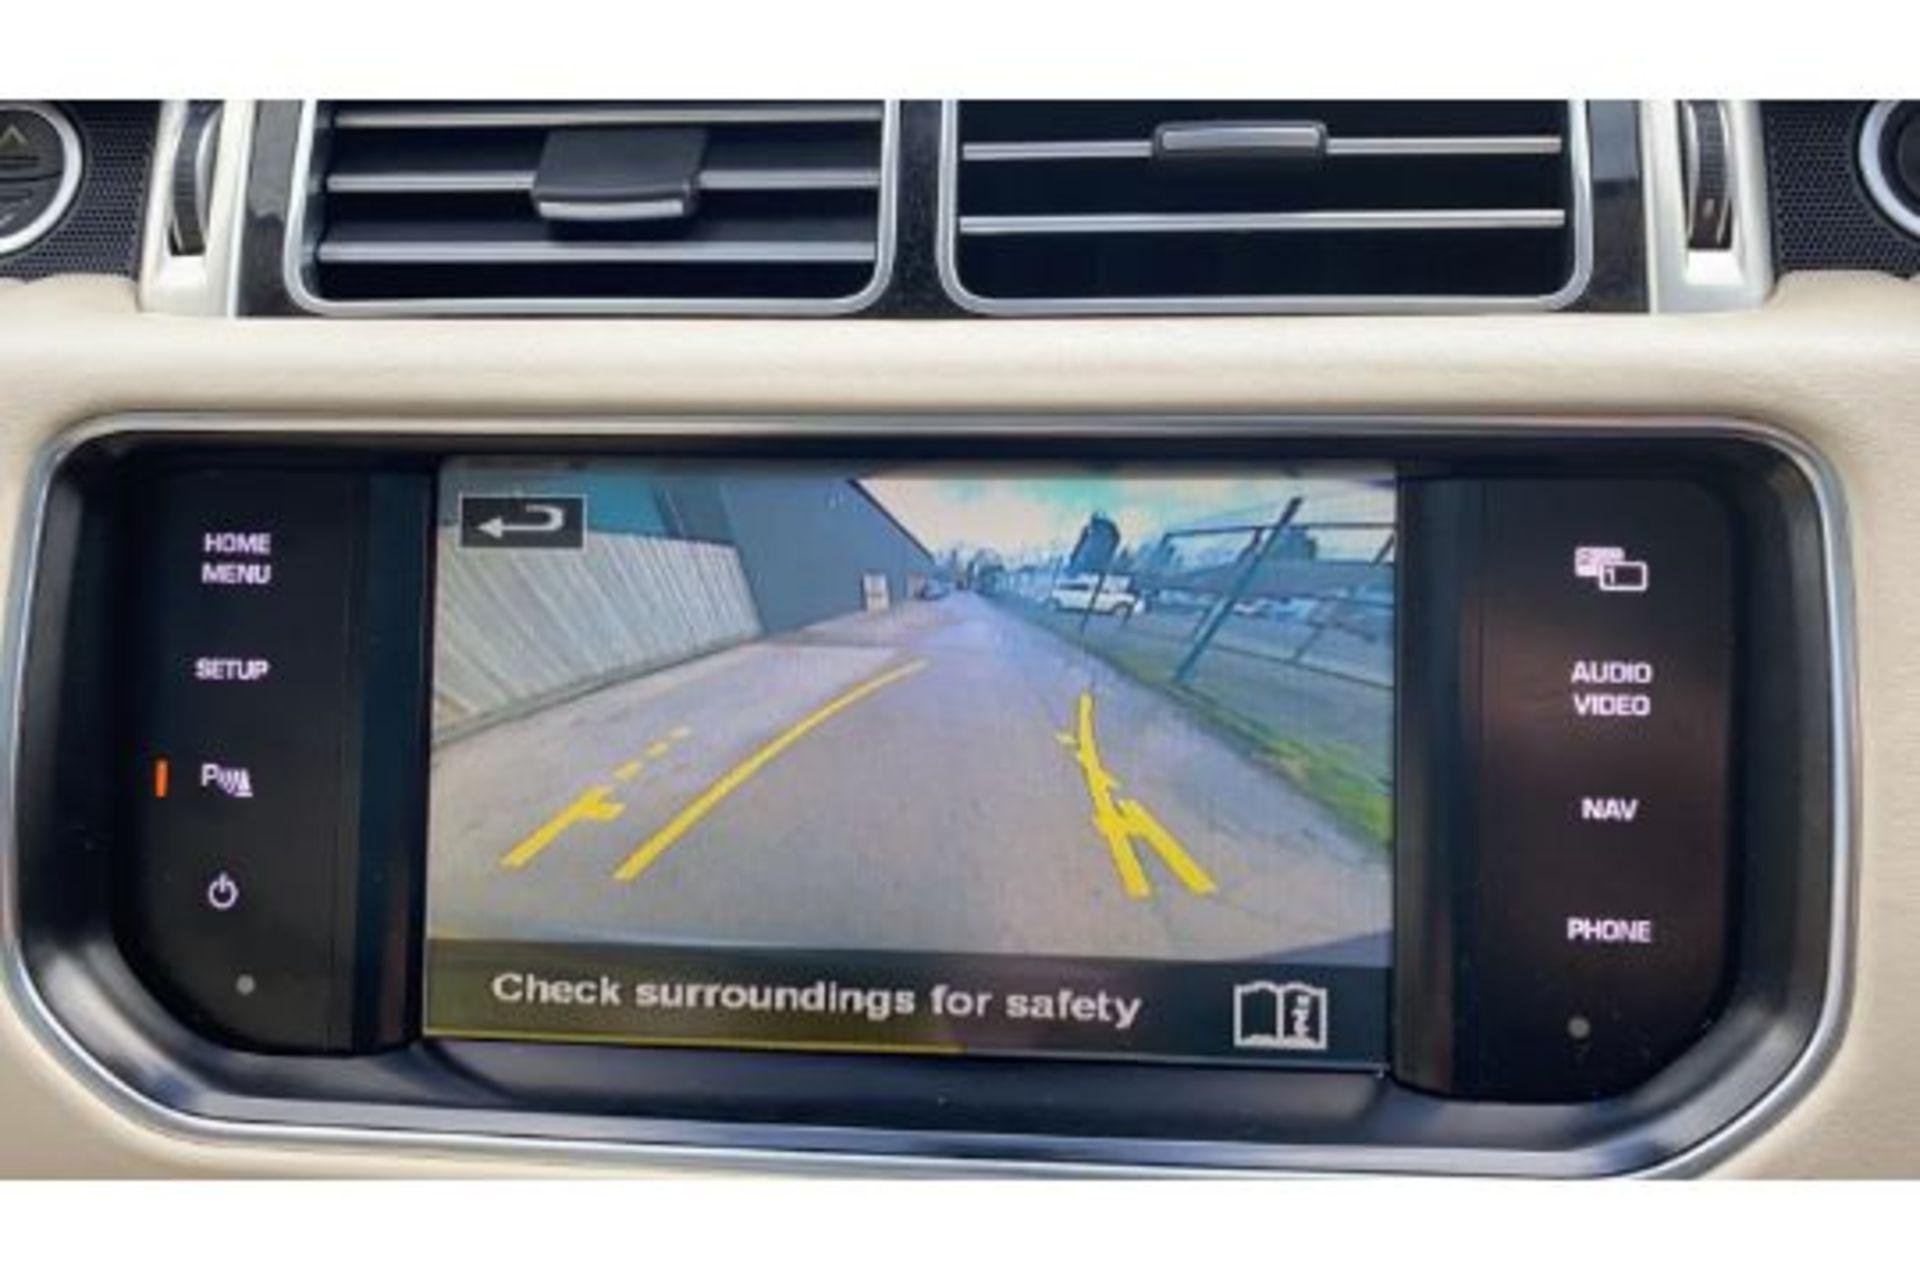 Range Rover Vogue 3.0 TDV6 SE Auto - Black Pack - NEW SHAPE - FULLY LOADED - Pan Roof - Image 10 of 30